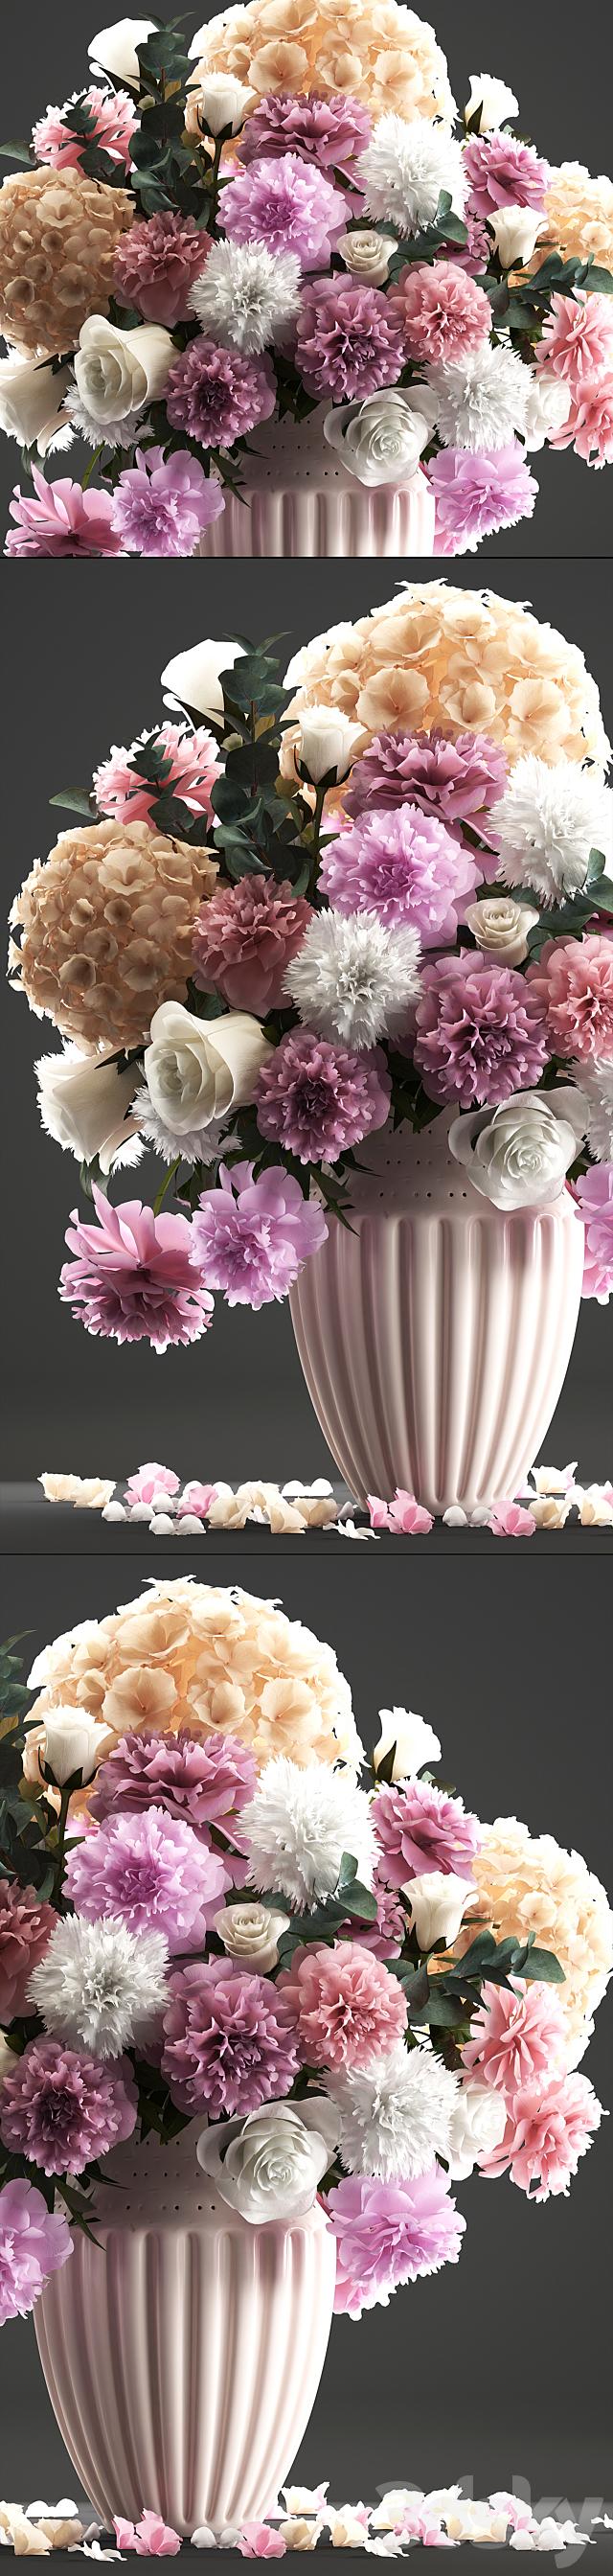 Bouquet of flowers 61.